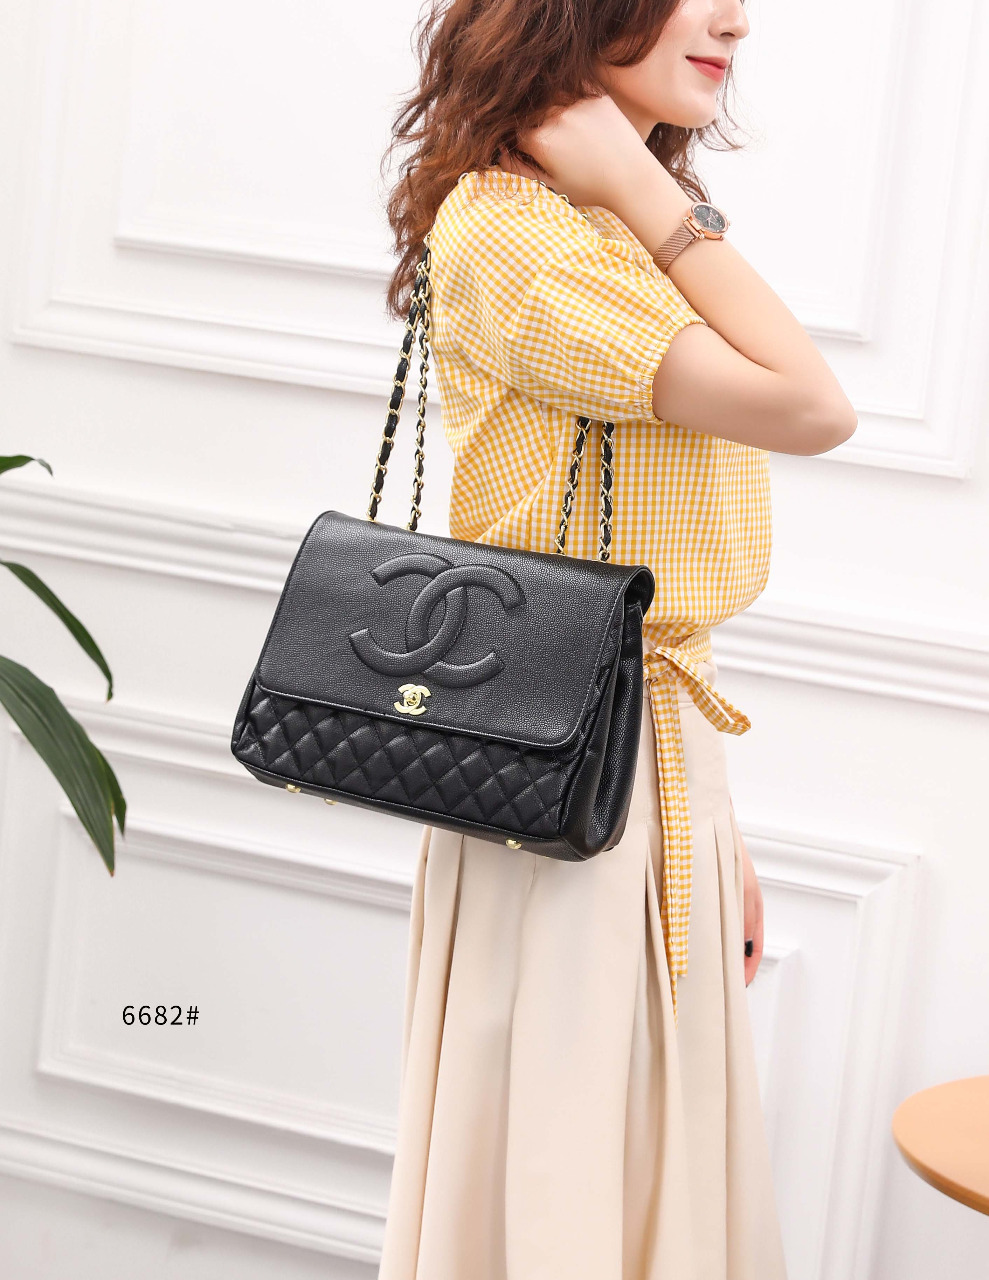 Tas wanita merk chanel terbaru, online shop tas chanel terbaru